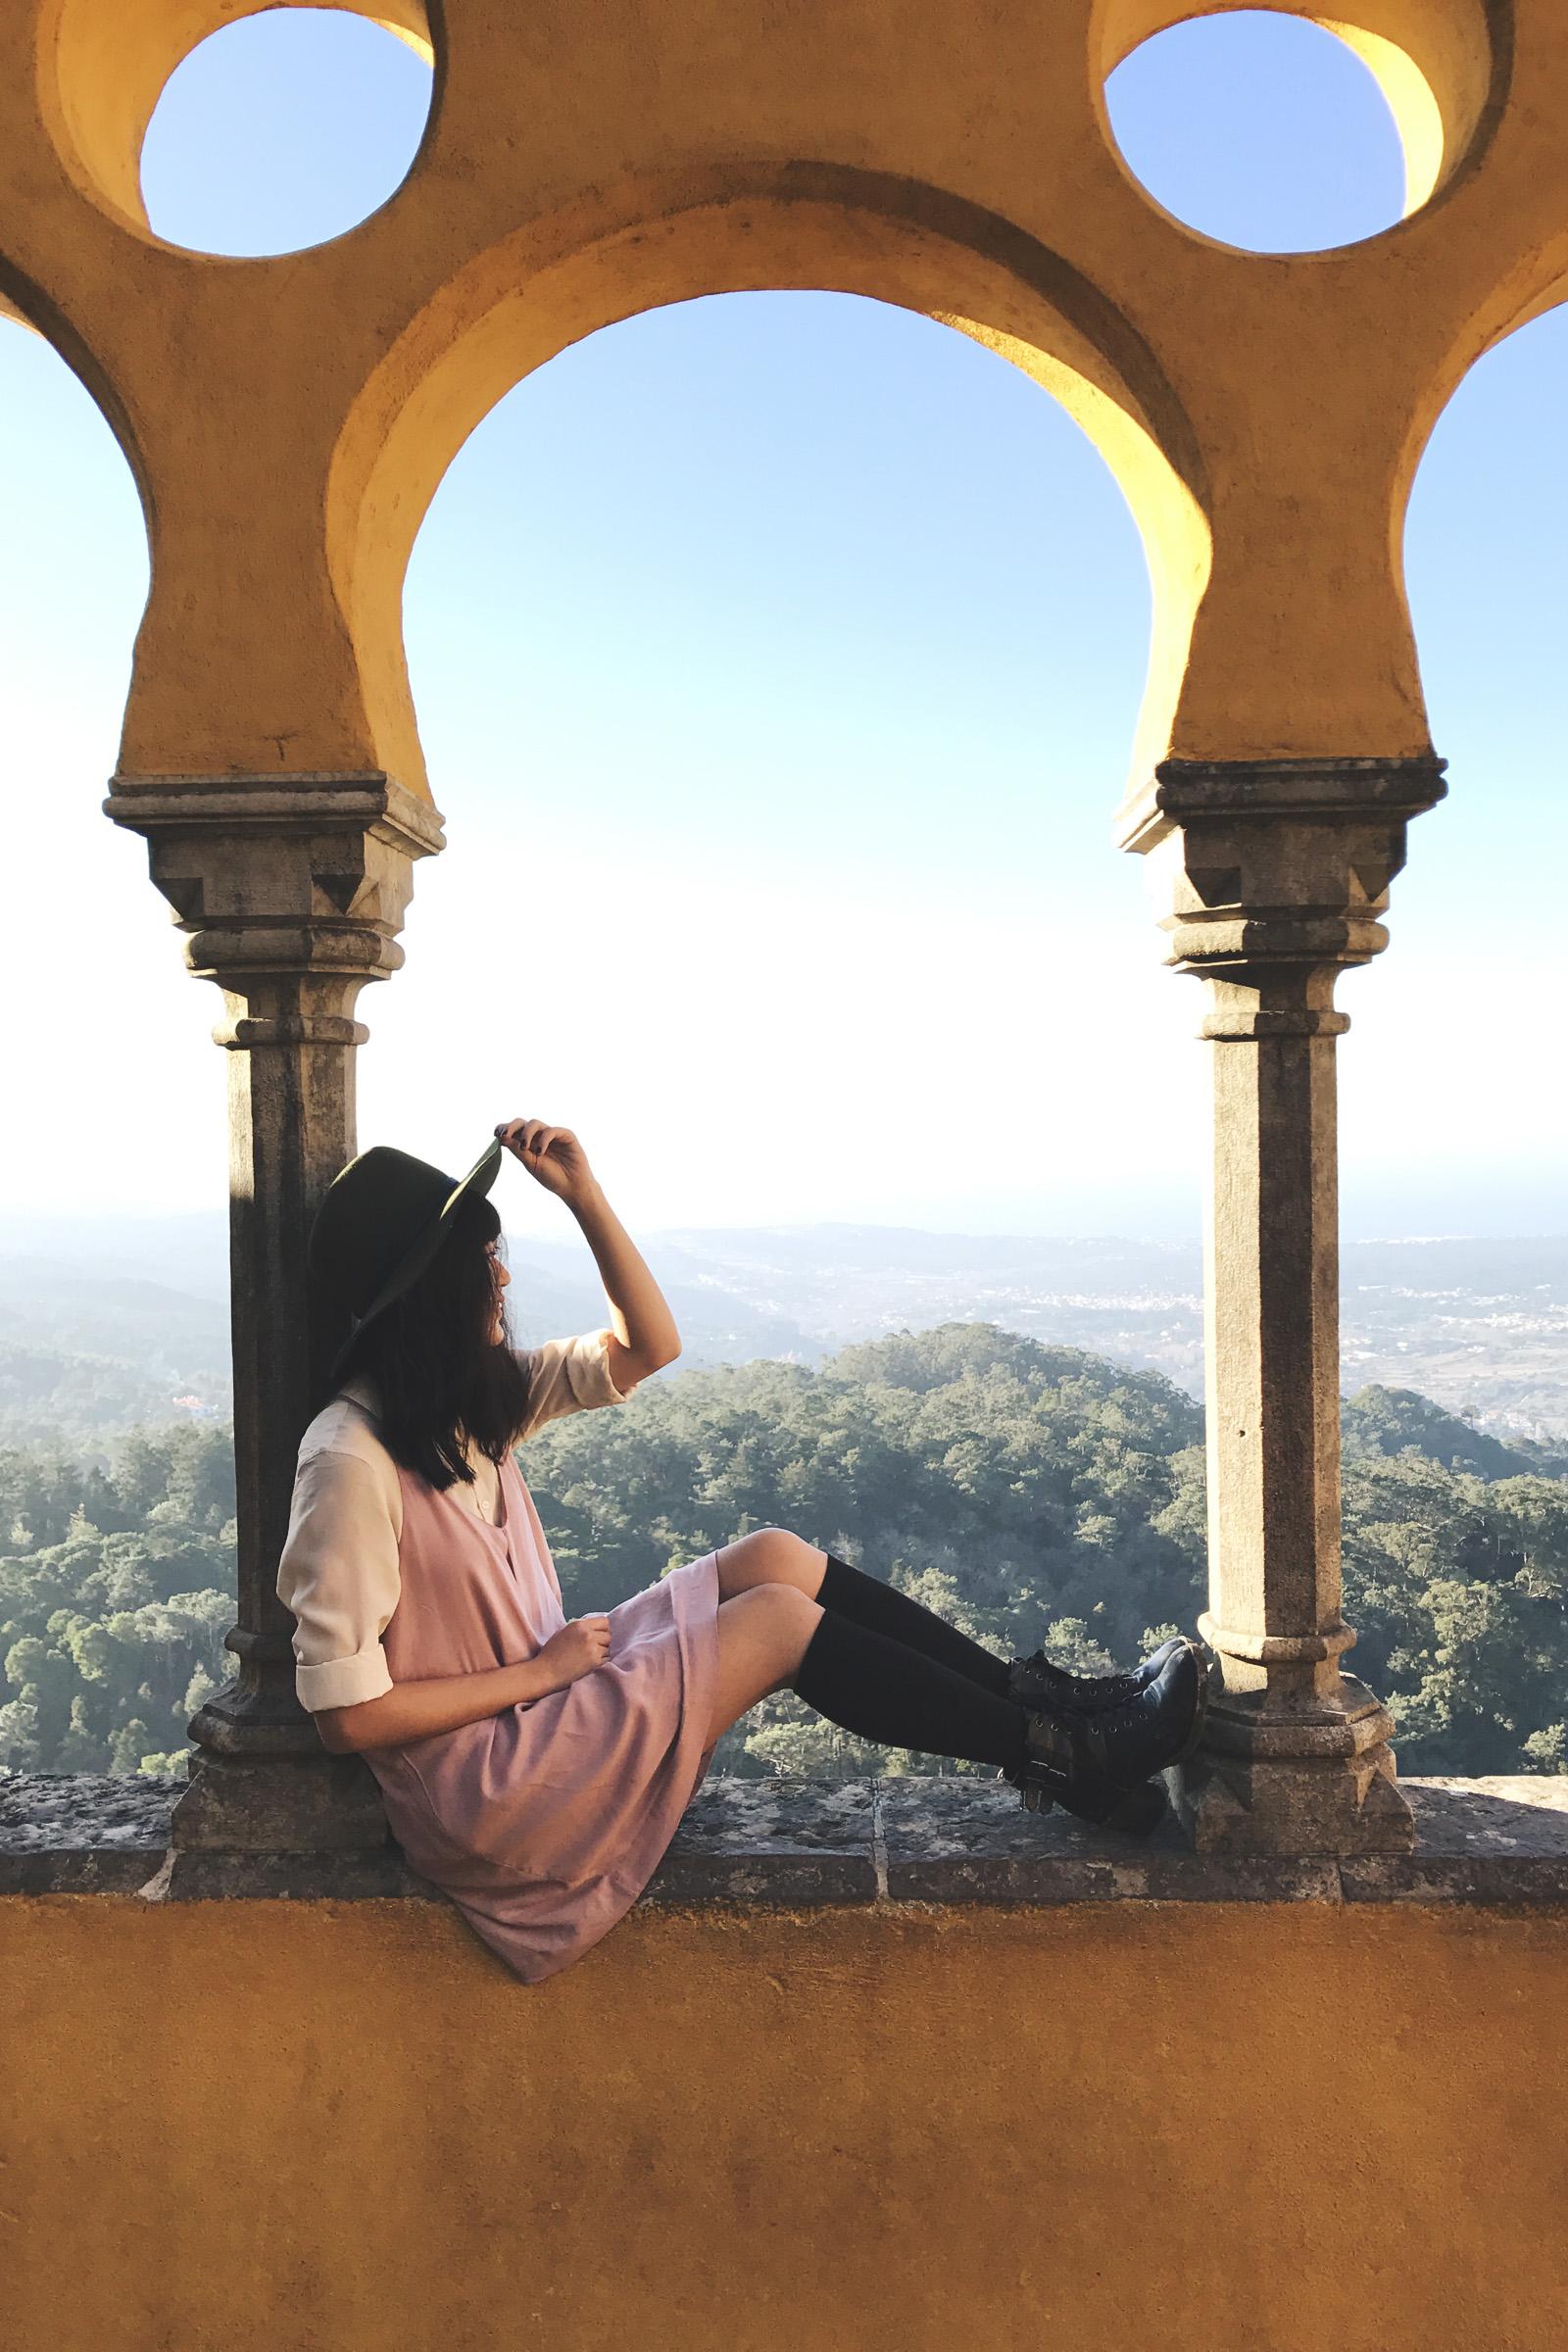 & Away We Went | #Travel Blog Wanderlust | Sintra, Portugal | Pena Palace